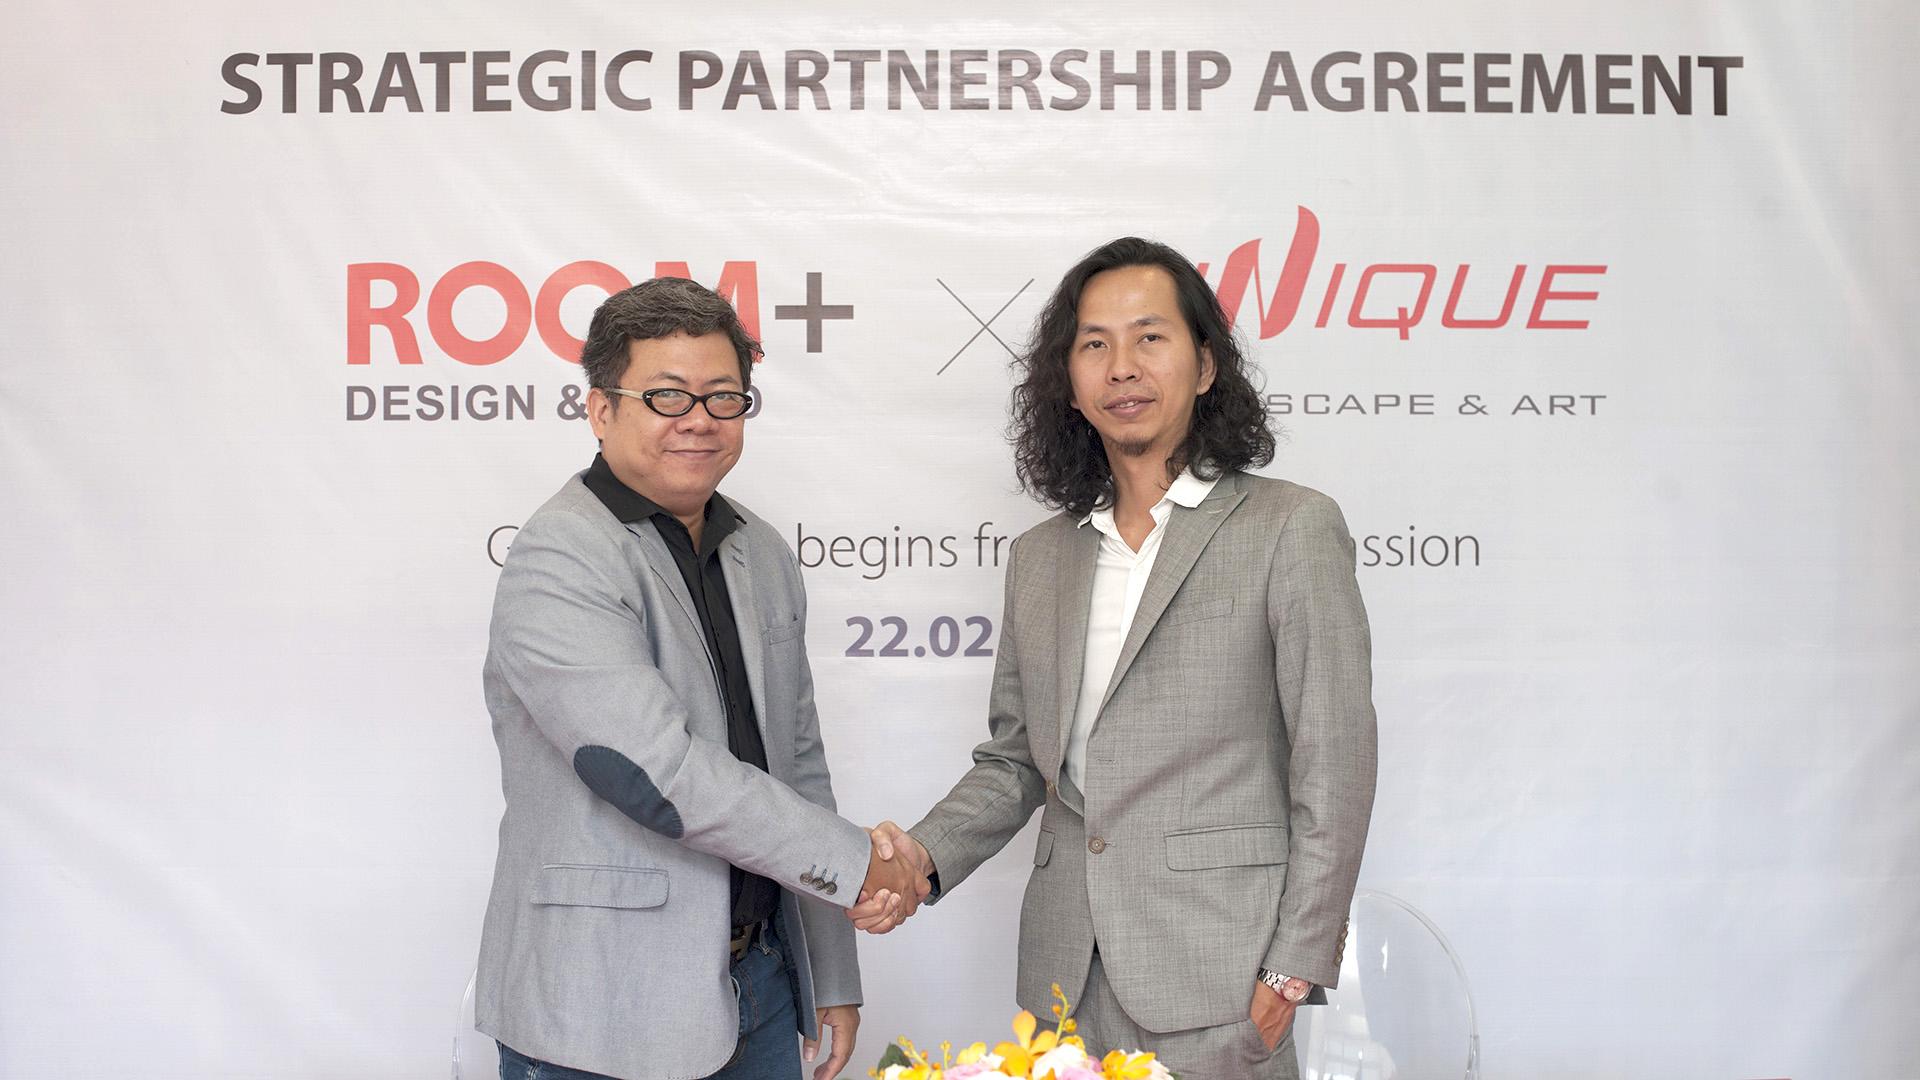 ROOM+ Design & Build & Unique Landscape & Arts (ULA) Strategic Partnership Signing (22/02/2020)